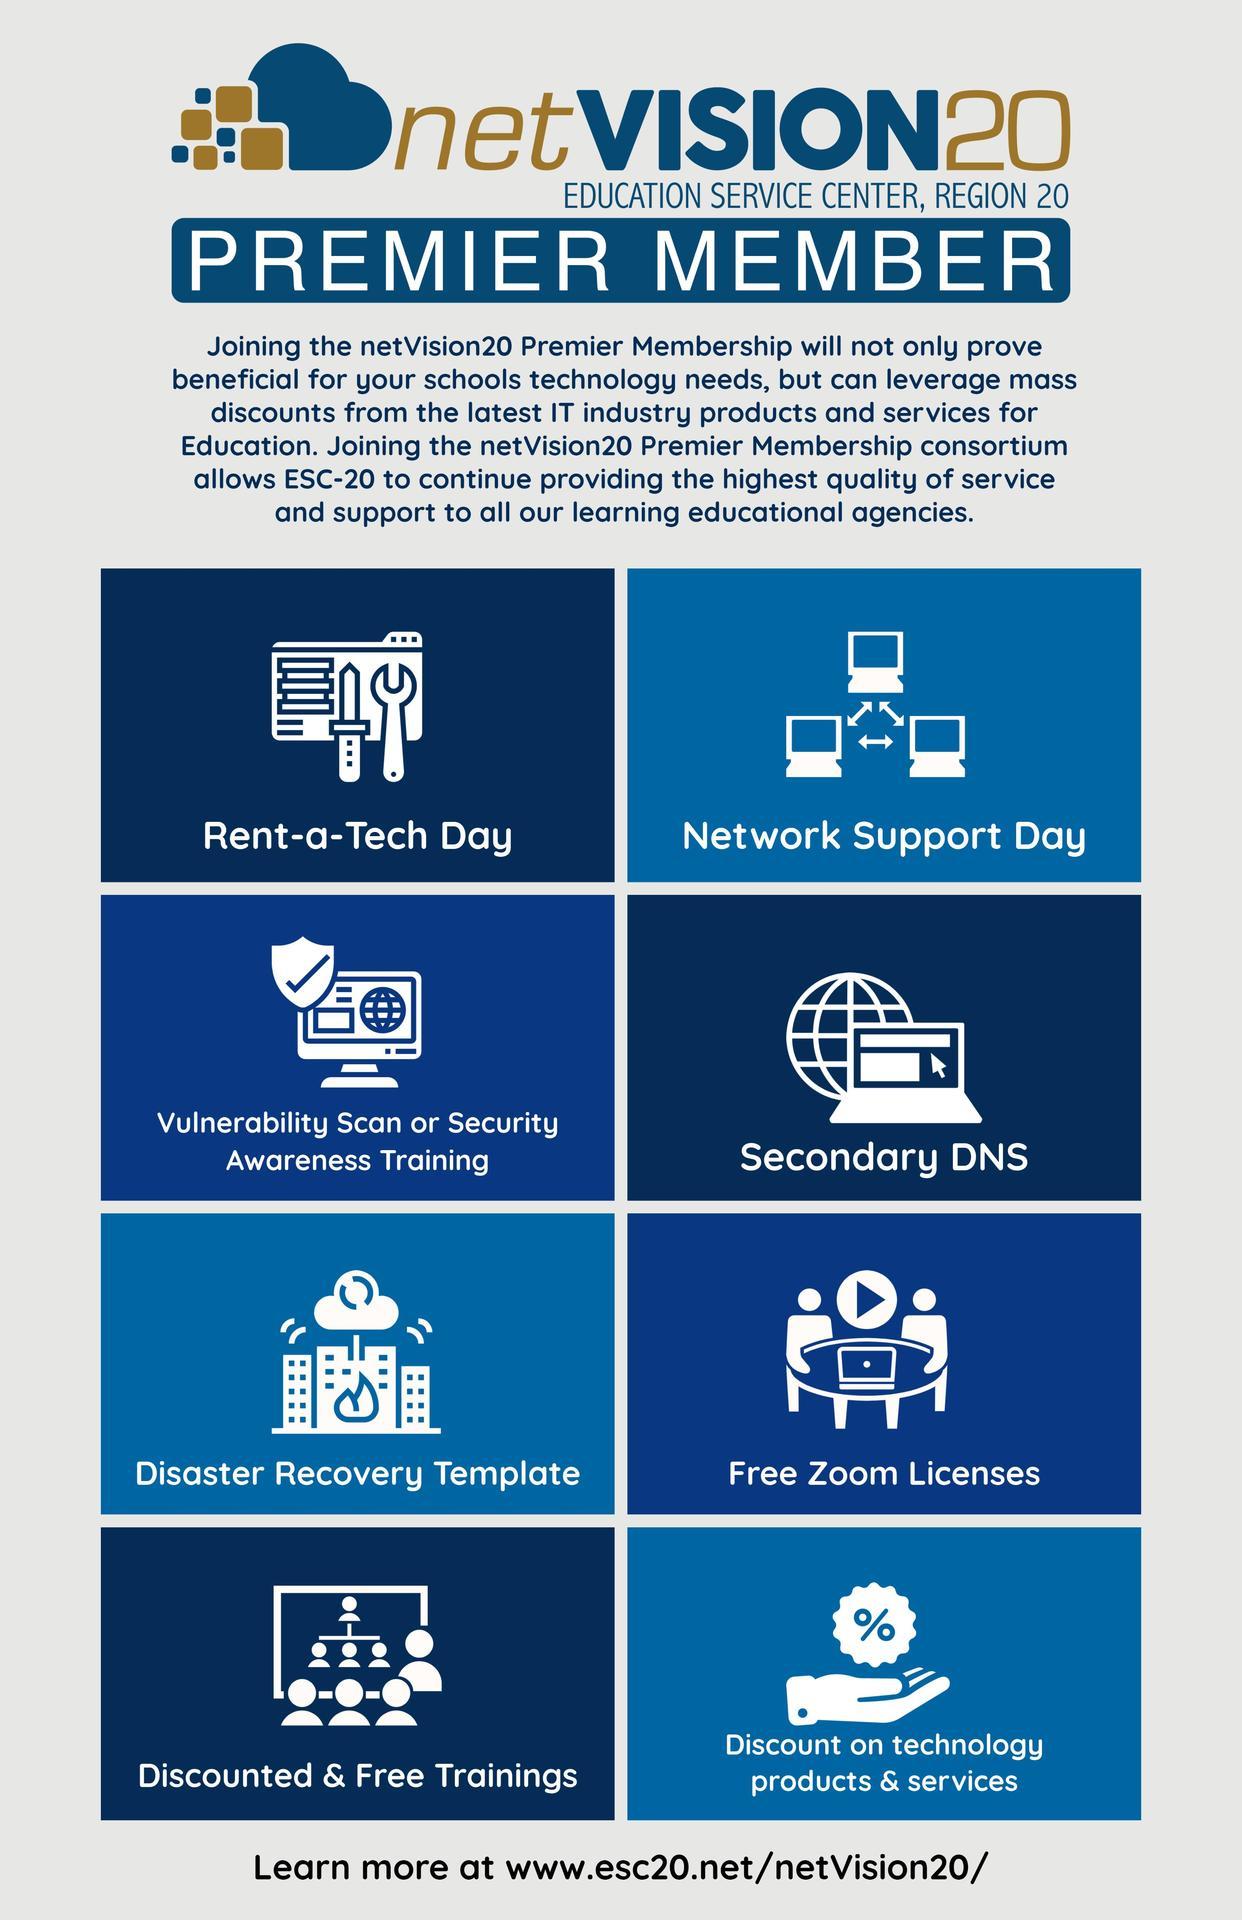 Premier Member Benefits Infographic